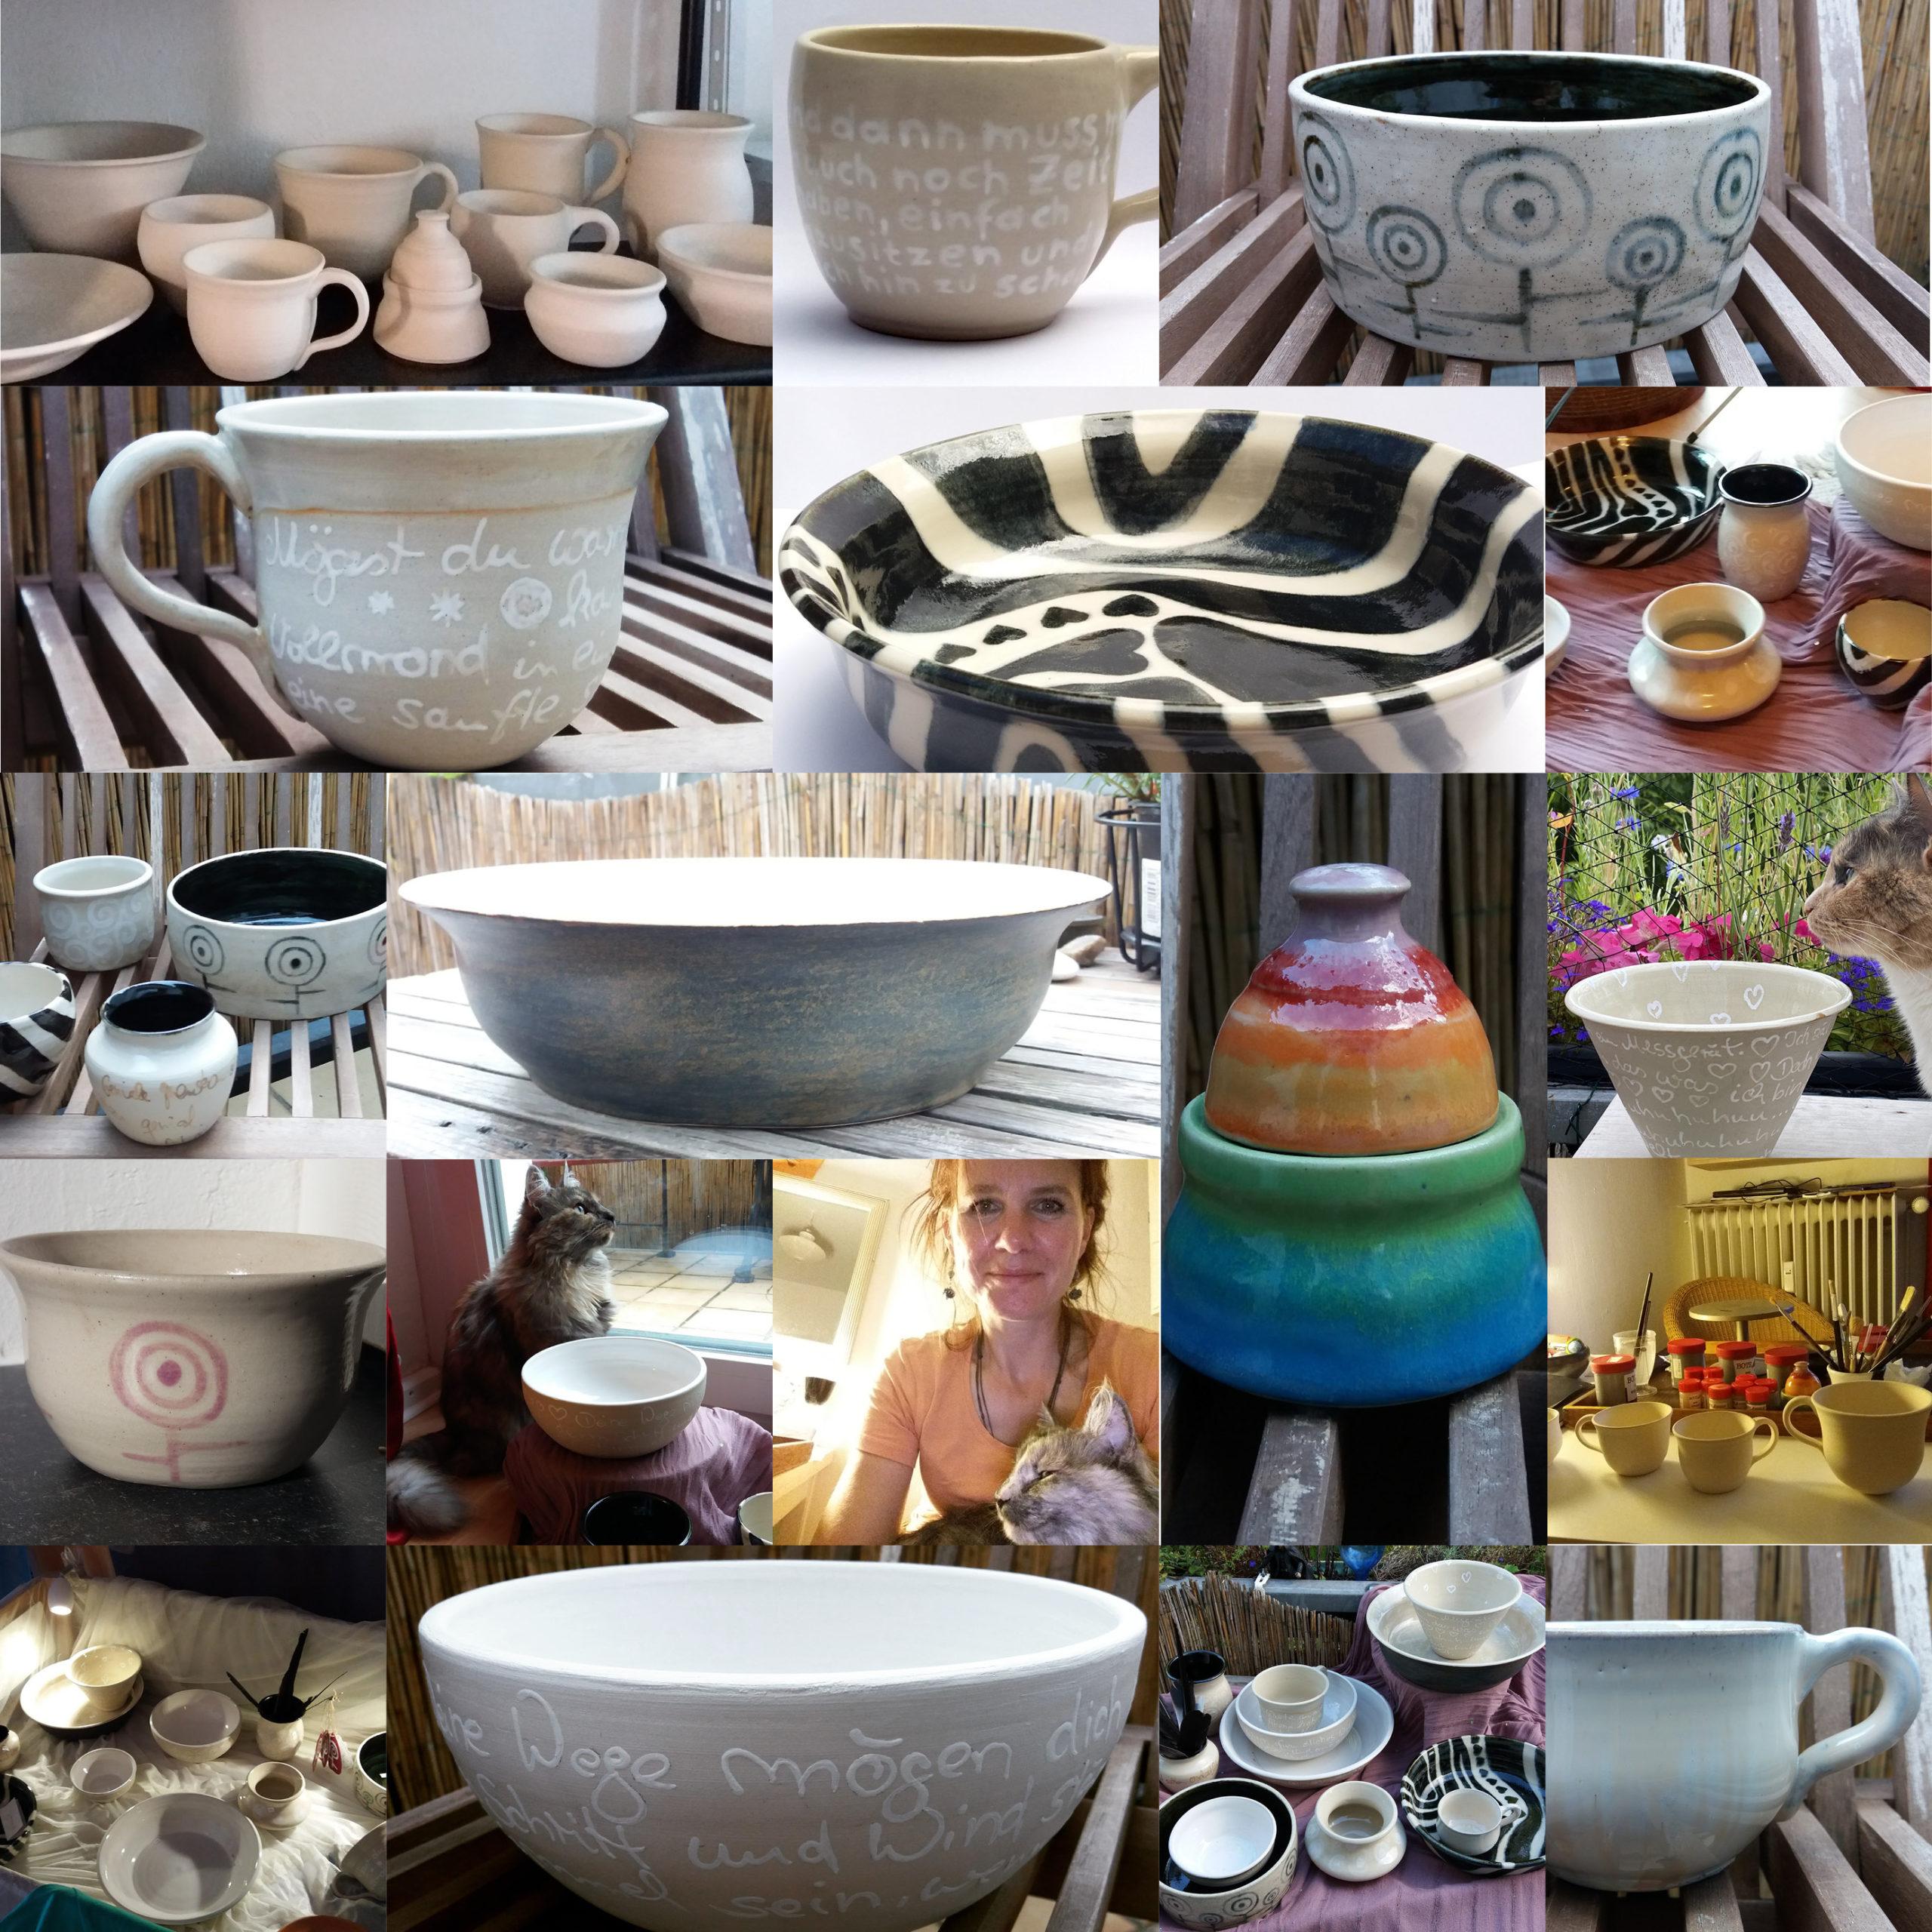 Keramik Beispiele 2016 Tamara Stadler